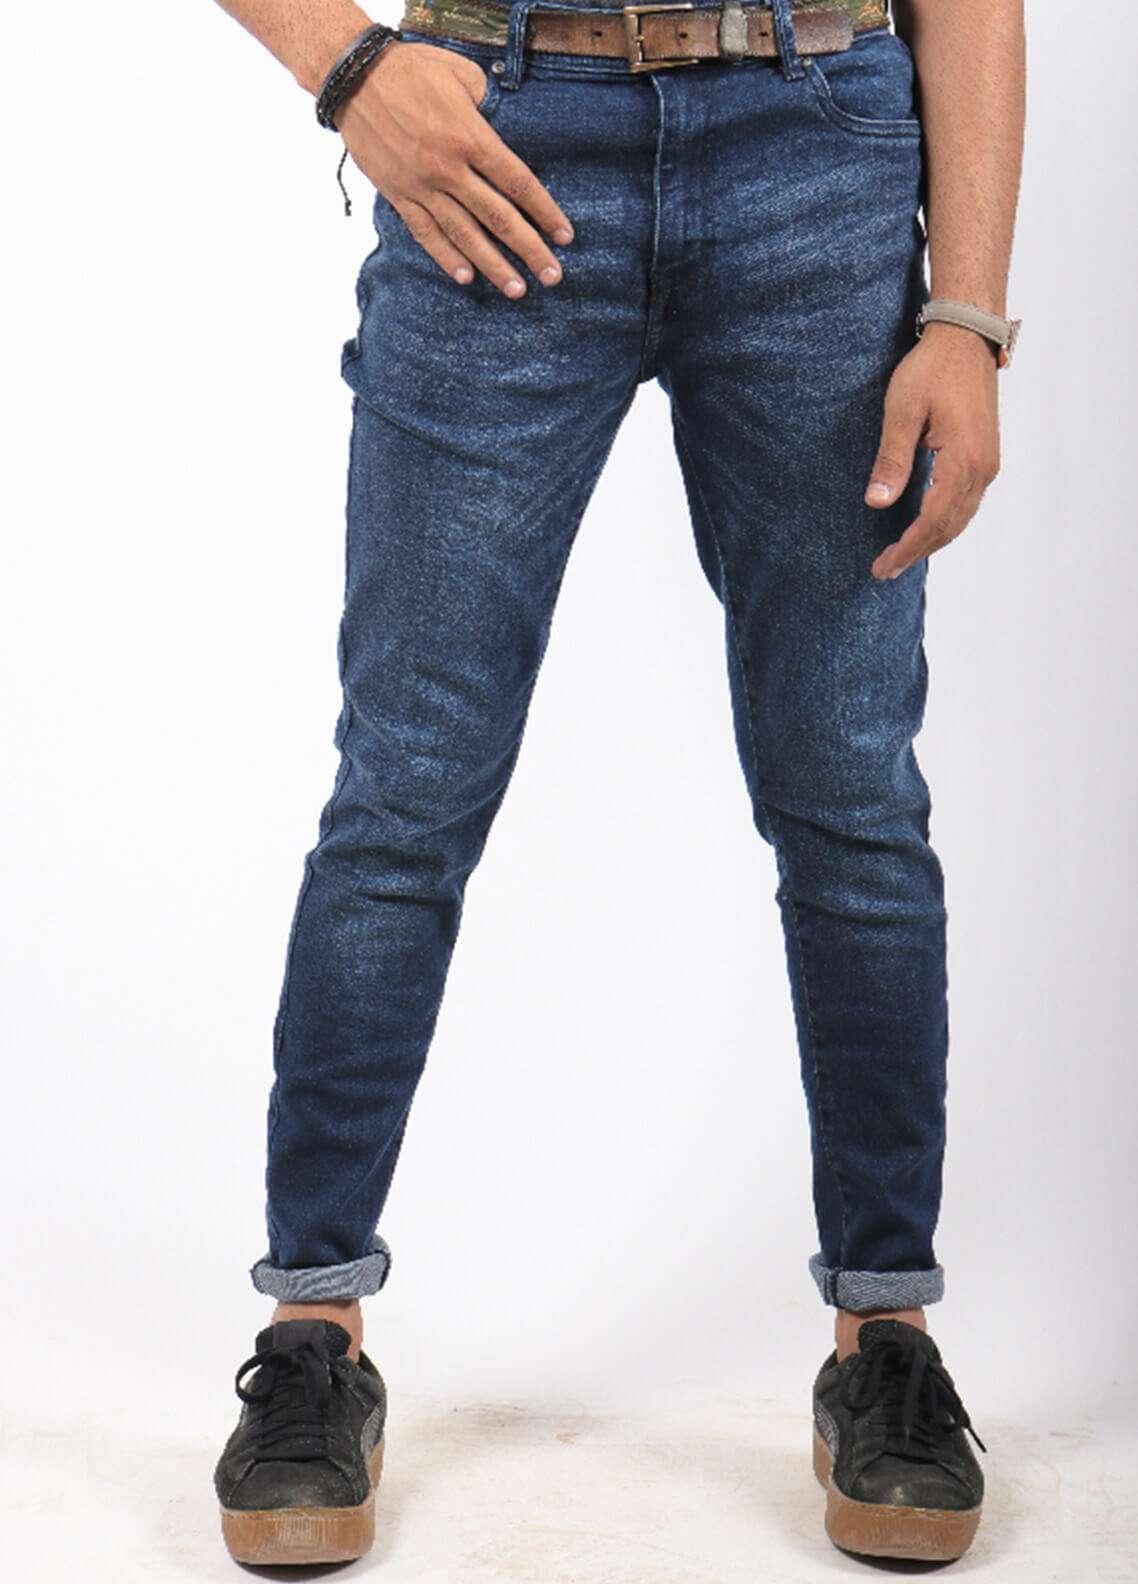 Red Tree Denim Casual Men Jeans - Blue RTP163